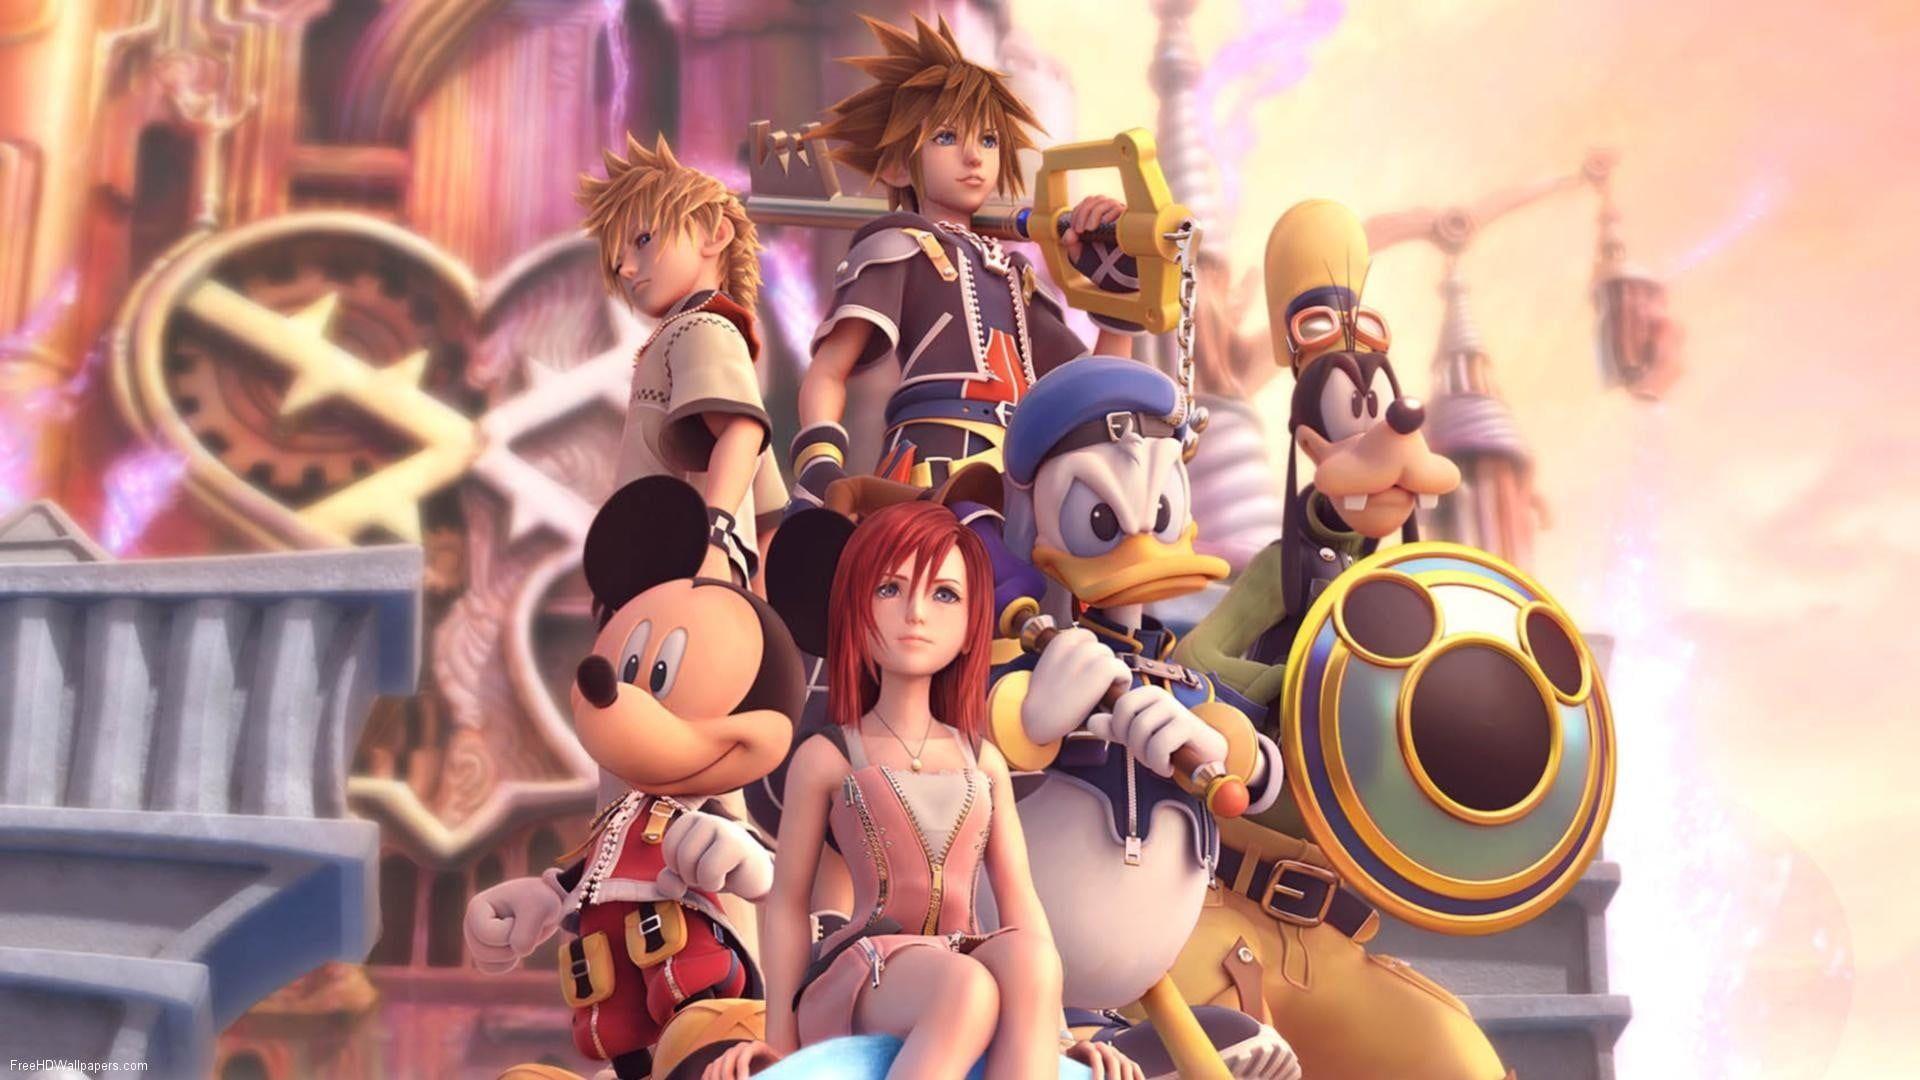 Assorted Disney Characters Illustration Sora Kingdom Hearts Donald Goofy Keys Video Games Kingdo In 2020 Kingdom Hearts Disney Characters Kingdom Hearts Wallpaper